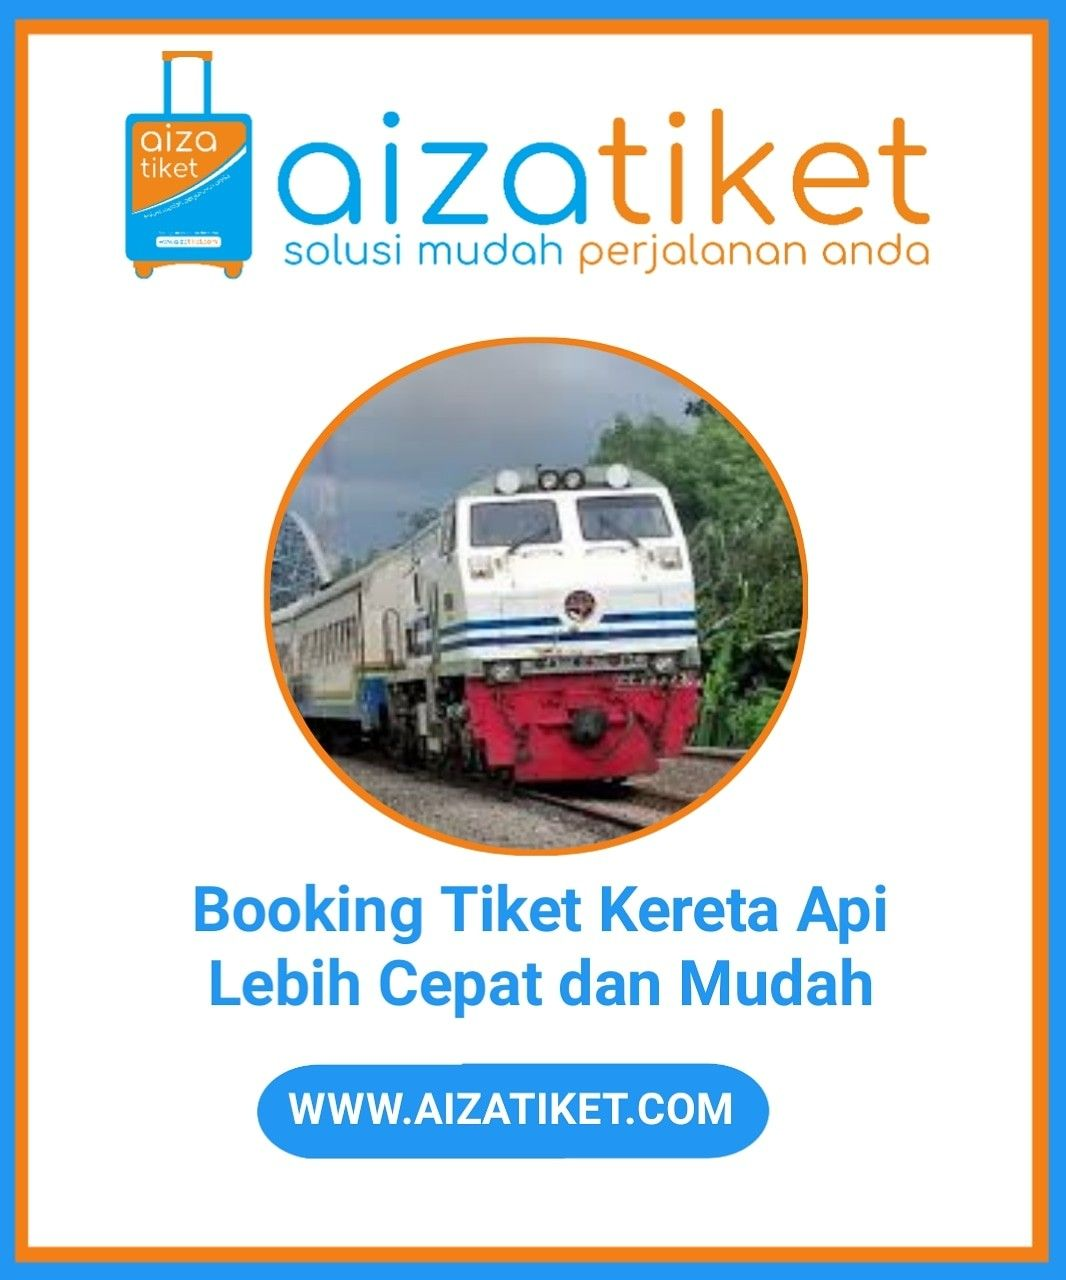 Booking Tiket Kereta Api Lebih Cepat Dan Mudah Bersama